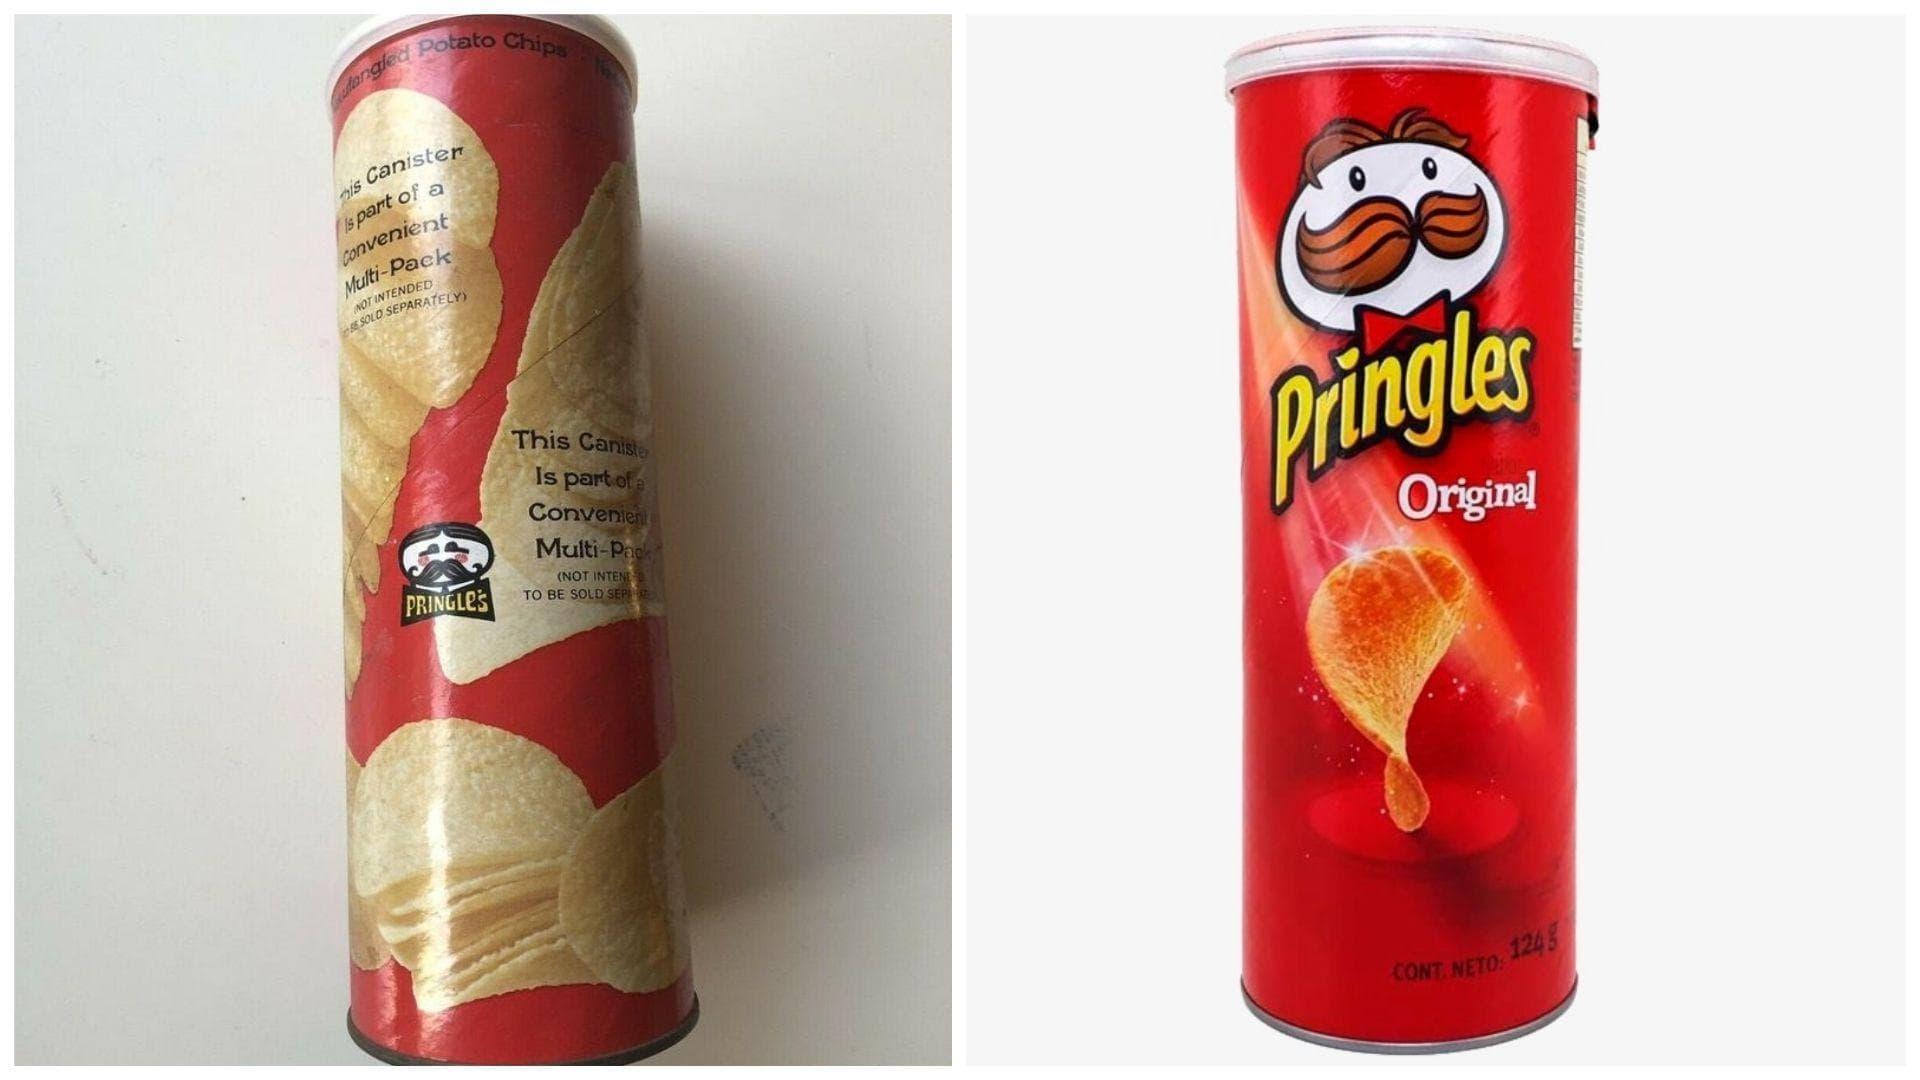 Pringles, 1970s Vs. 2019 on Random Potato Chip Bags Have Changed Over Tim